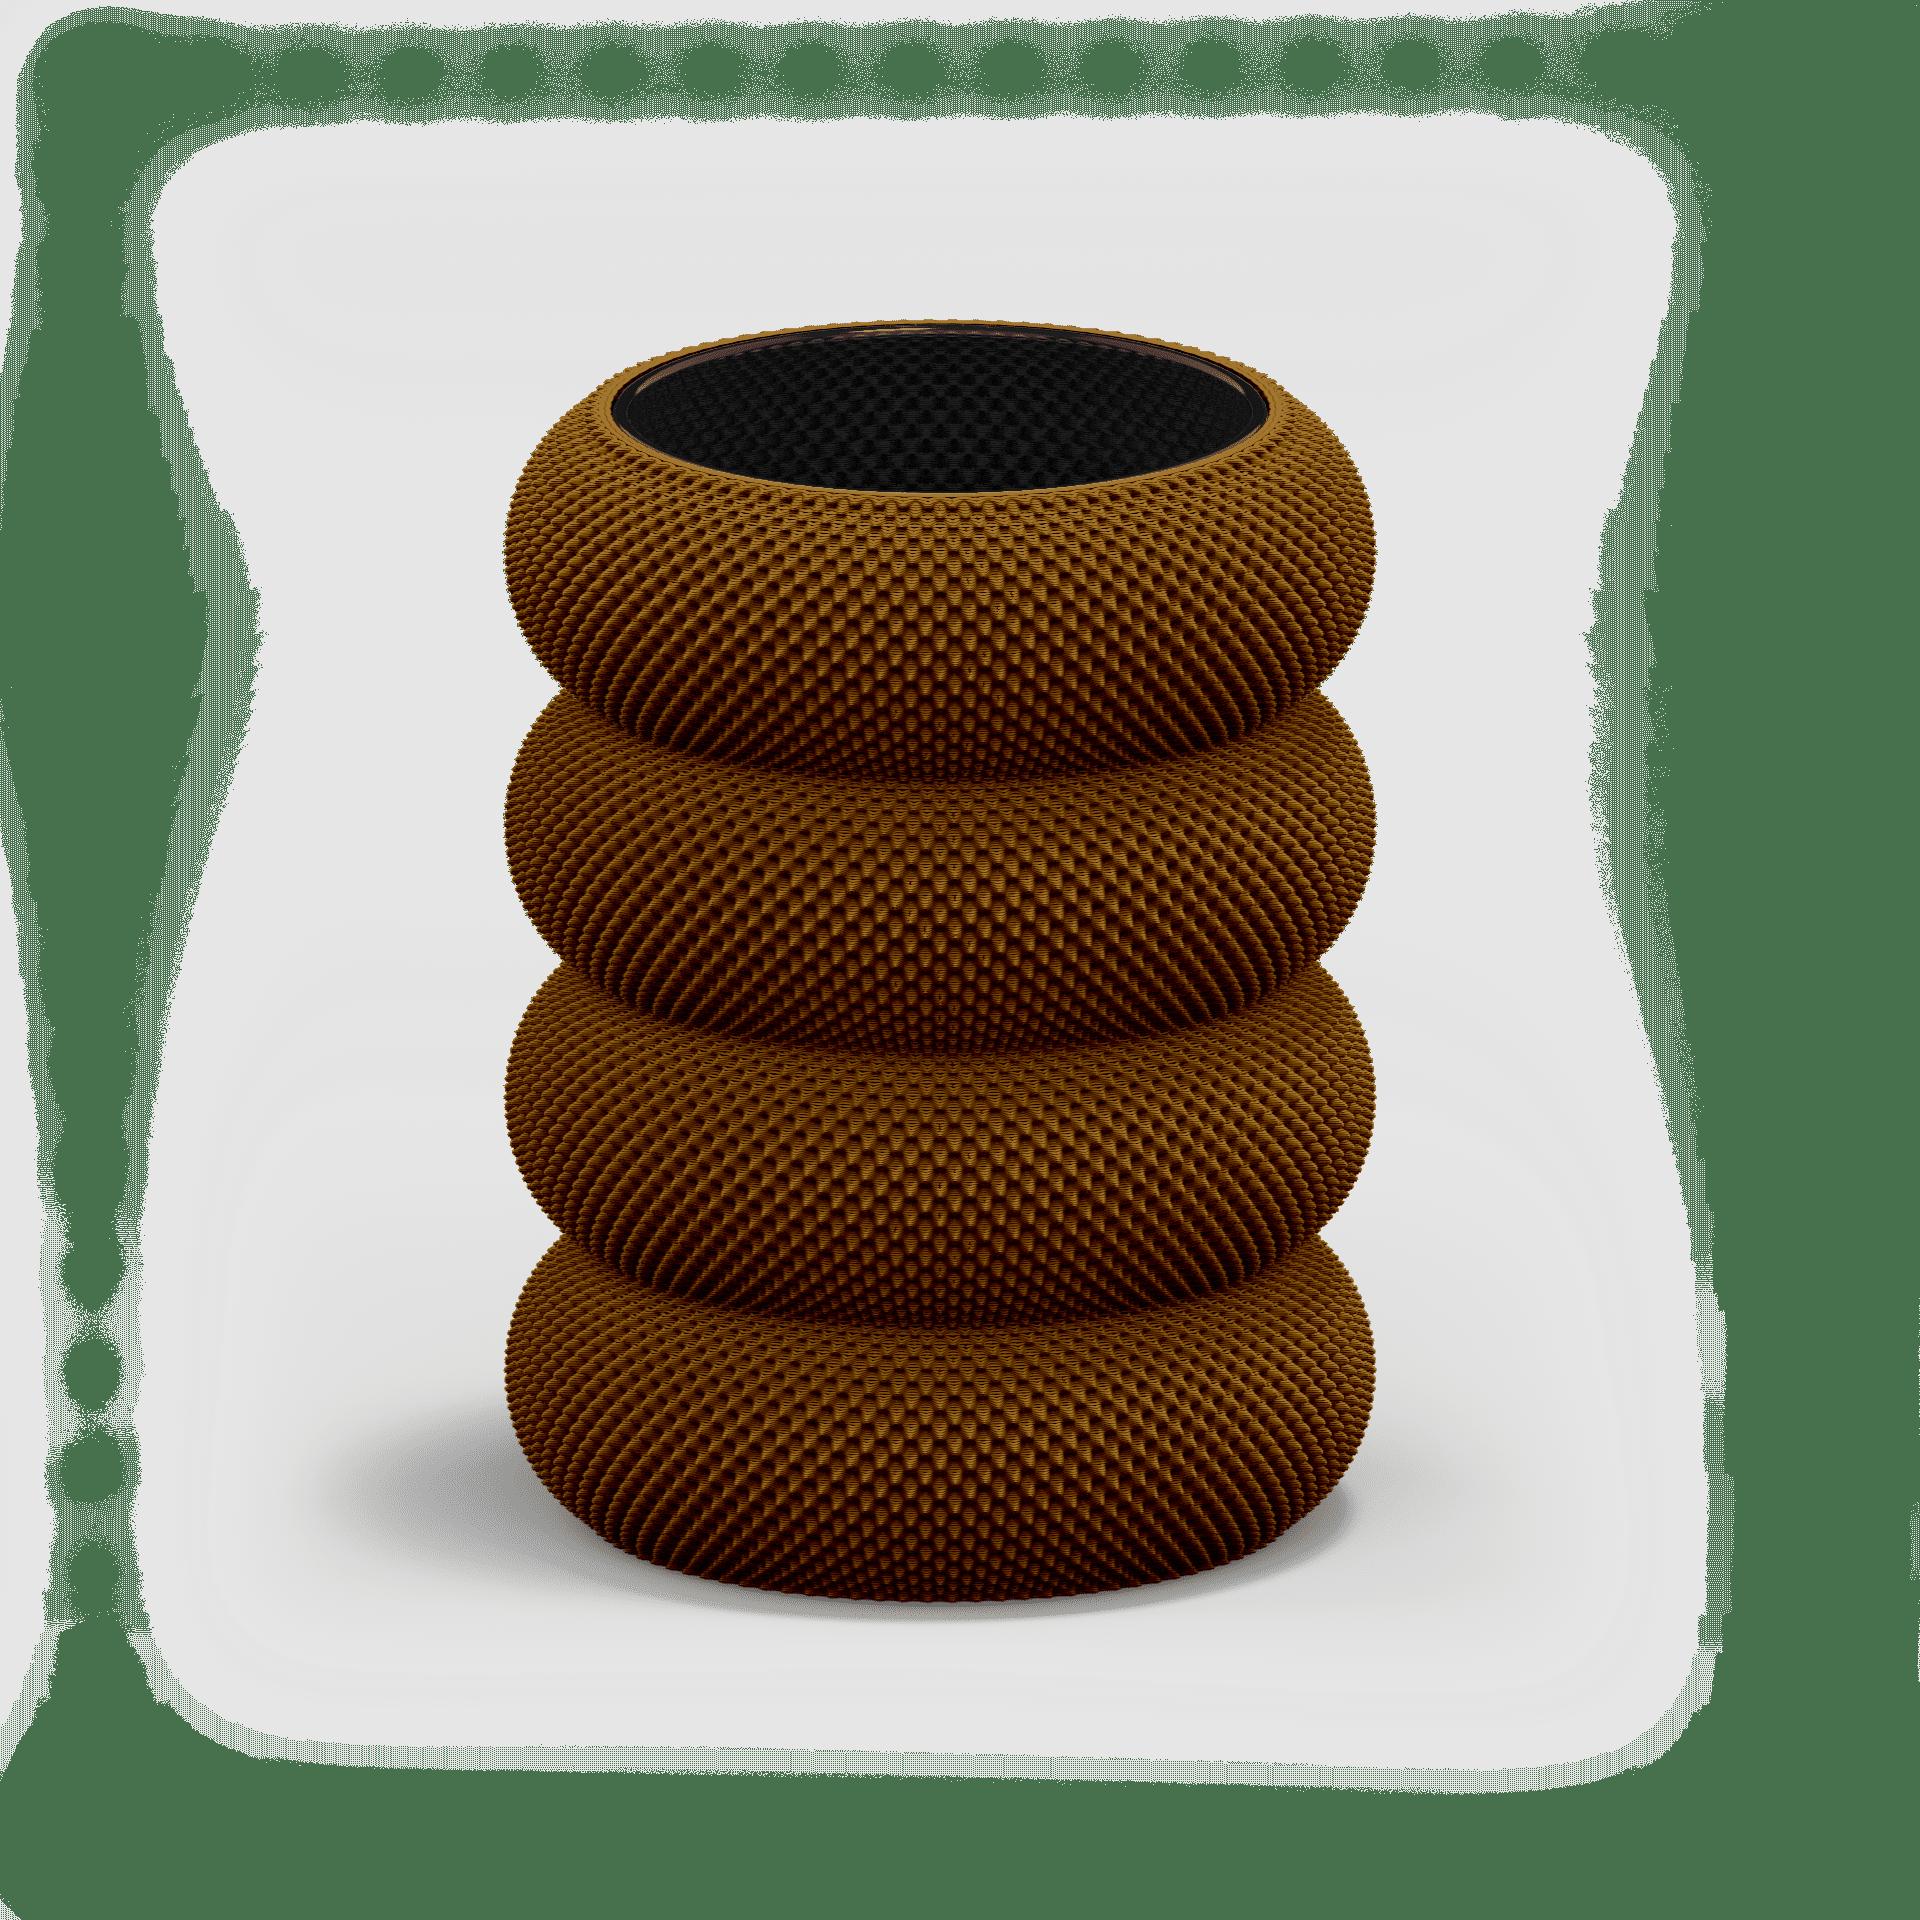 Dorn 341g 1c Vase Cinnamon